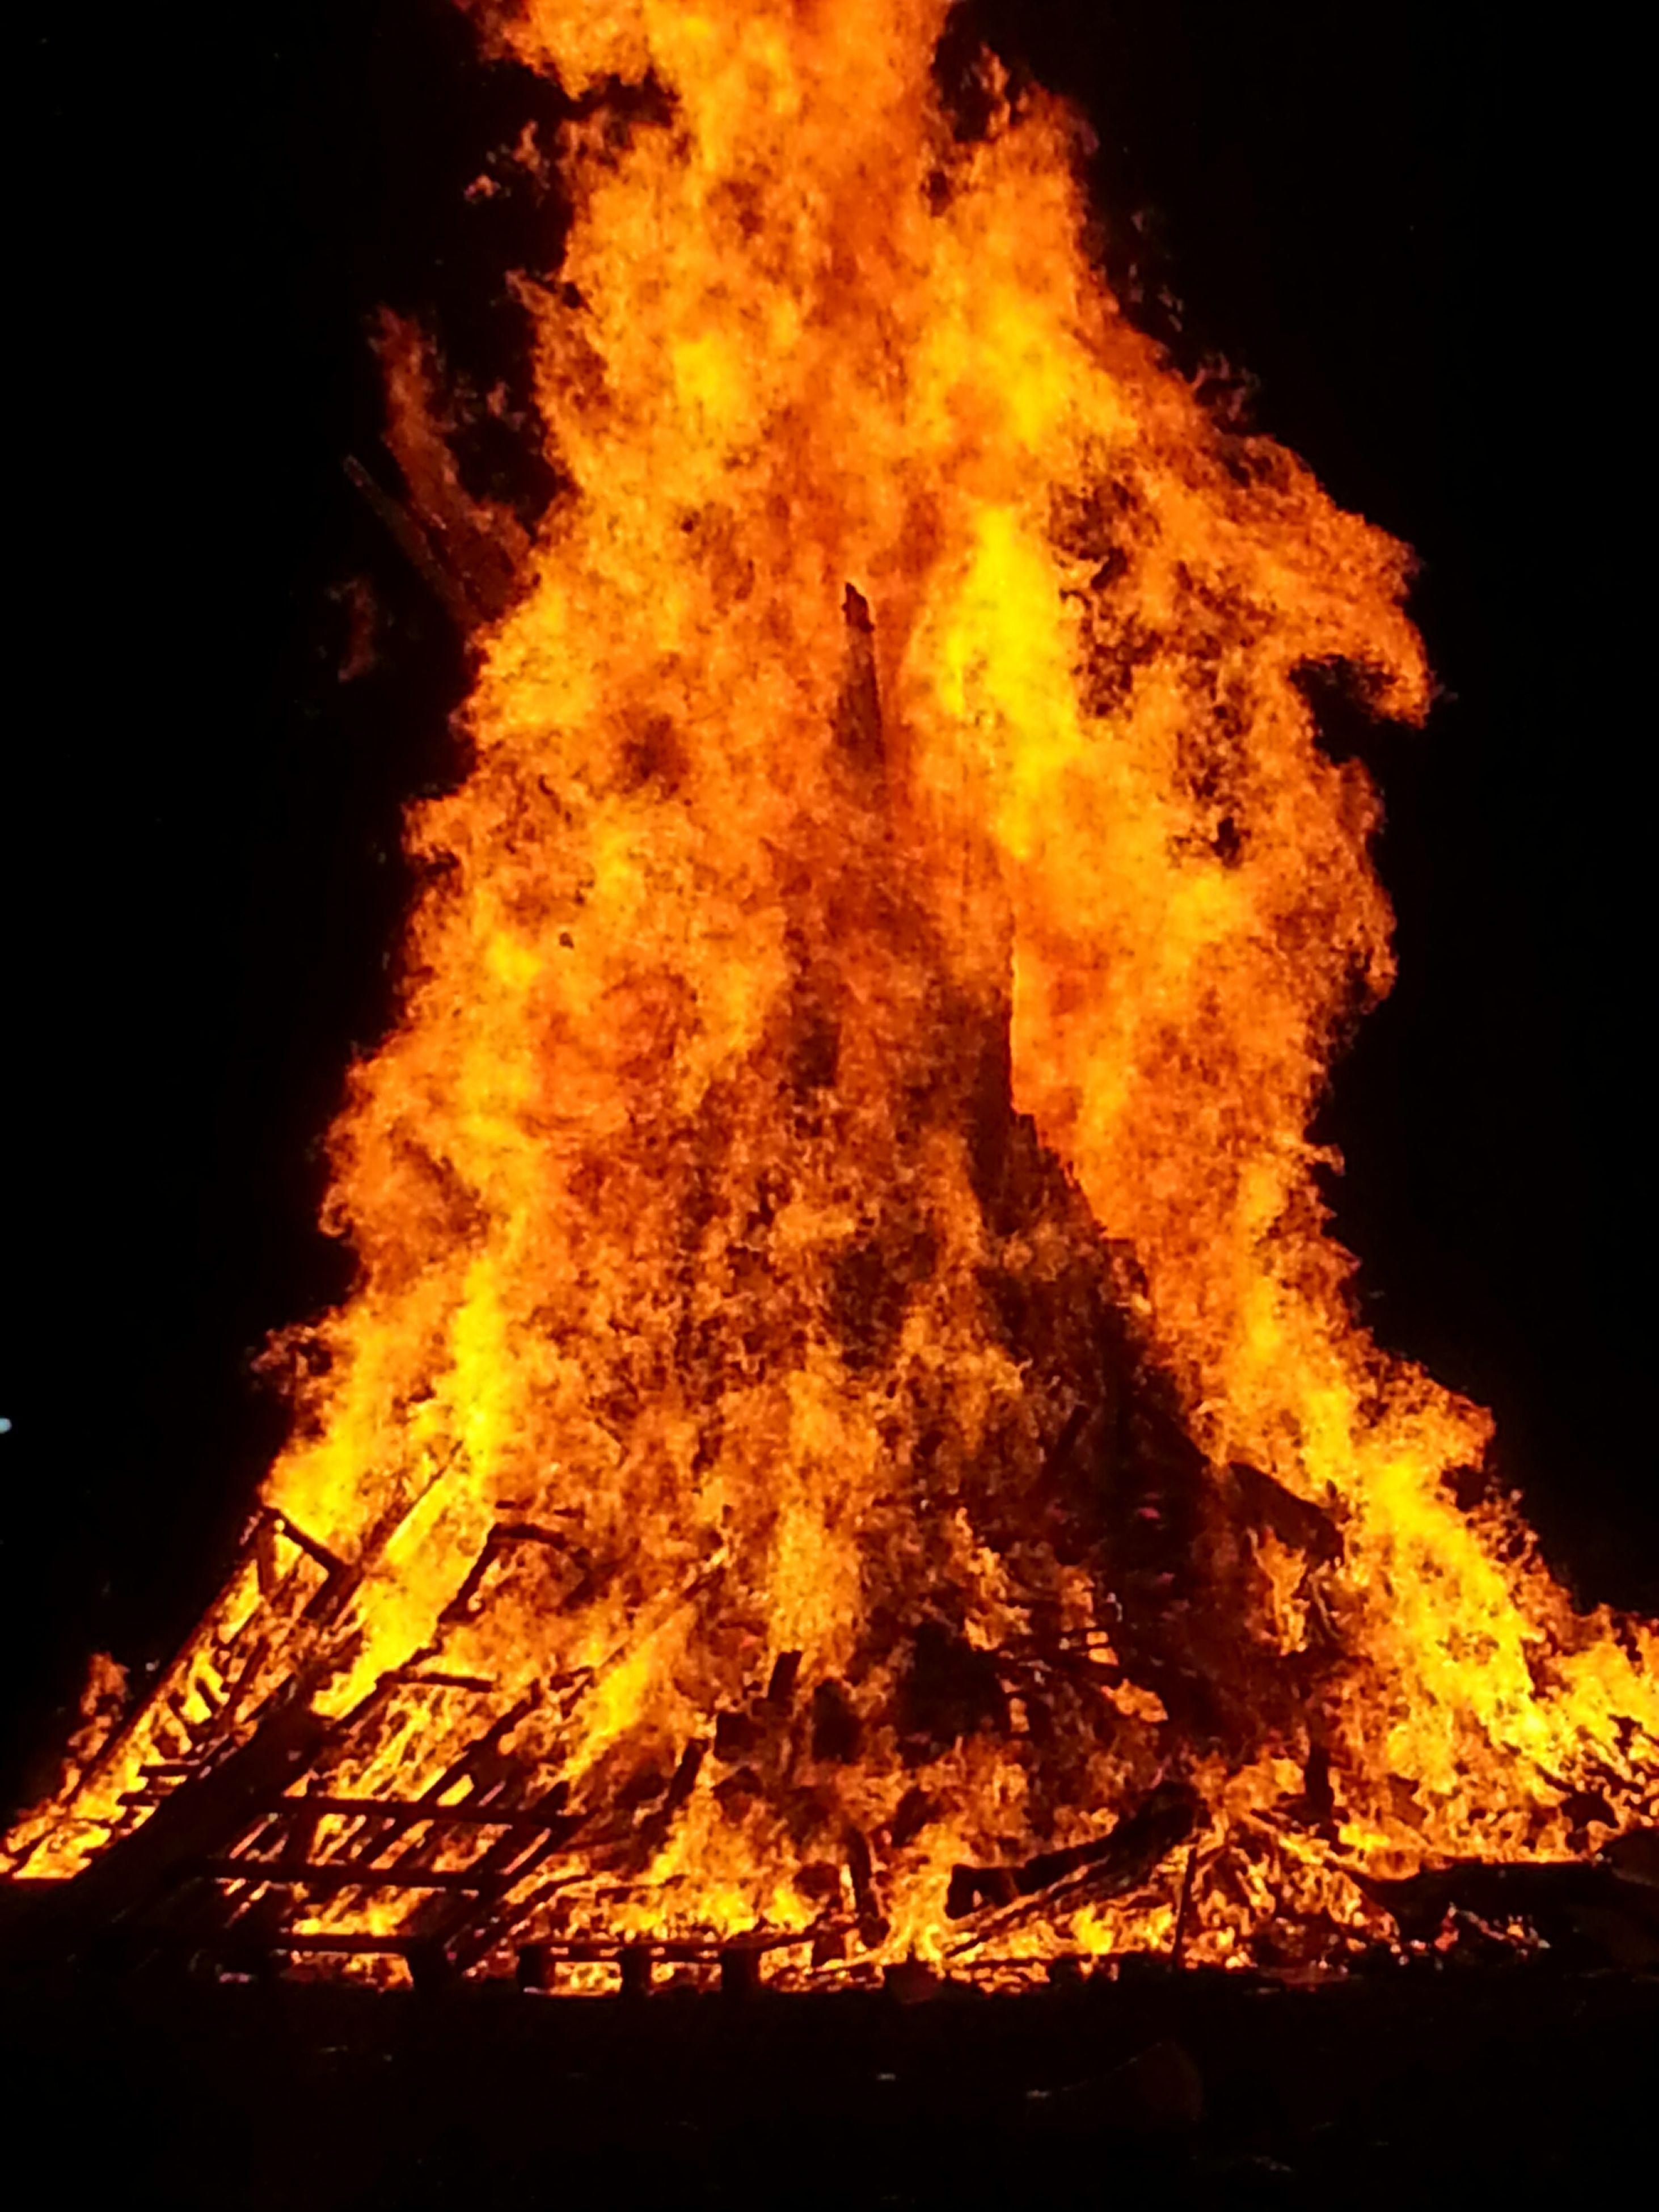 night, burning, fire - natural phenomenon, flame, heat - temperature, glowing, yellow, illuminated, long exposure, motion, orange color, dark, bonfire, fire, light - natural phenomenon, campfire, close-up, no people, outdoors, abstract